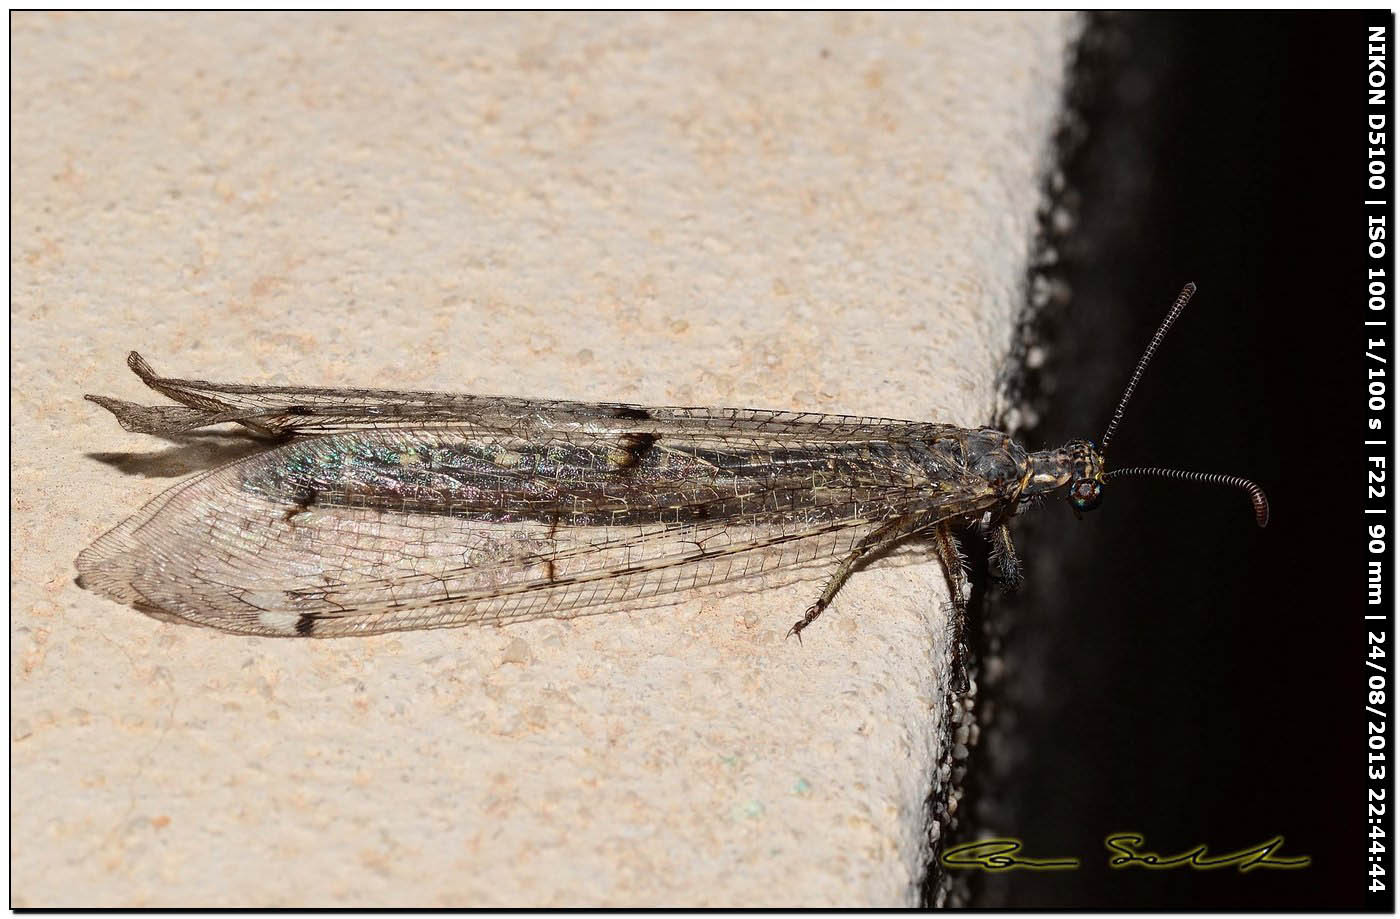 Myrmeleontidae, Distoleon tetragrammicus?